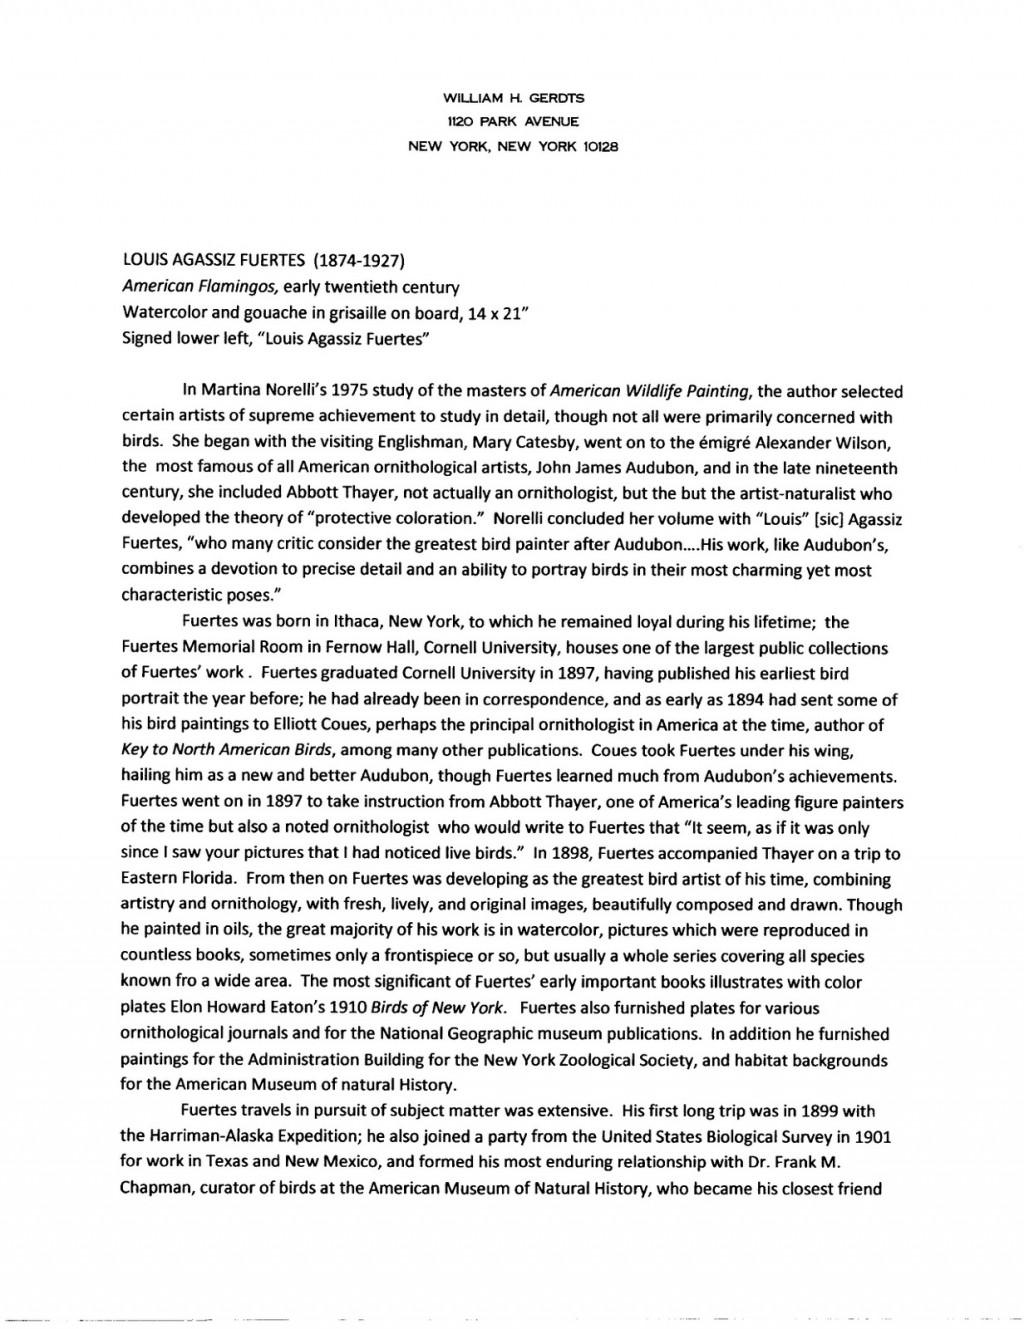 001 Fuertes20american20flamingos20001 Essay Example Grad Stupendous School Graduate Format Samples Admission Prompts Large